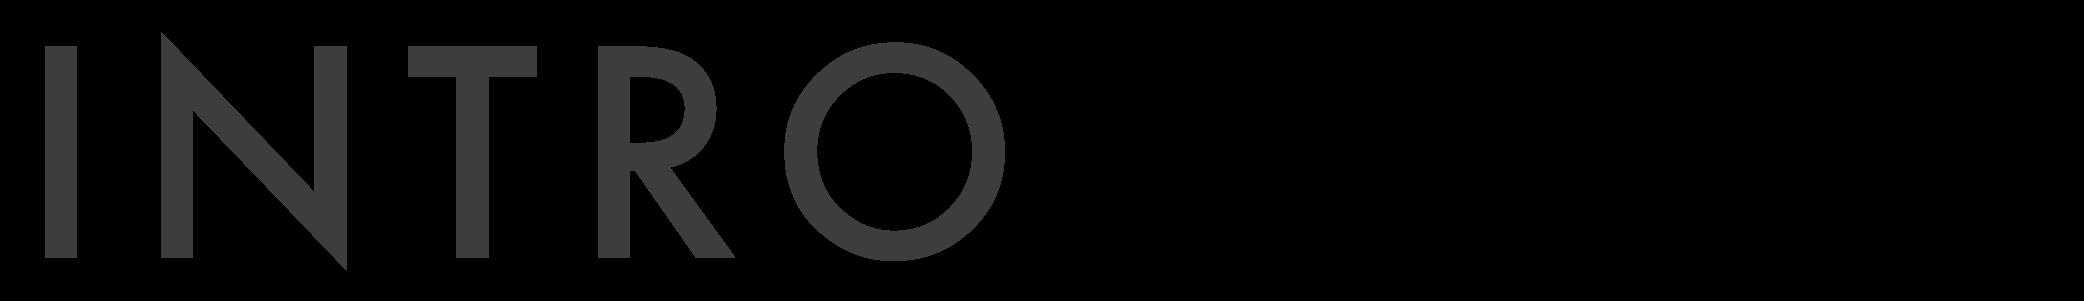 TDS-Website-Titles-INTRO-H1.png